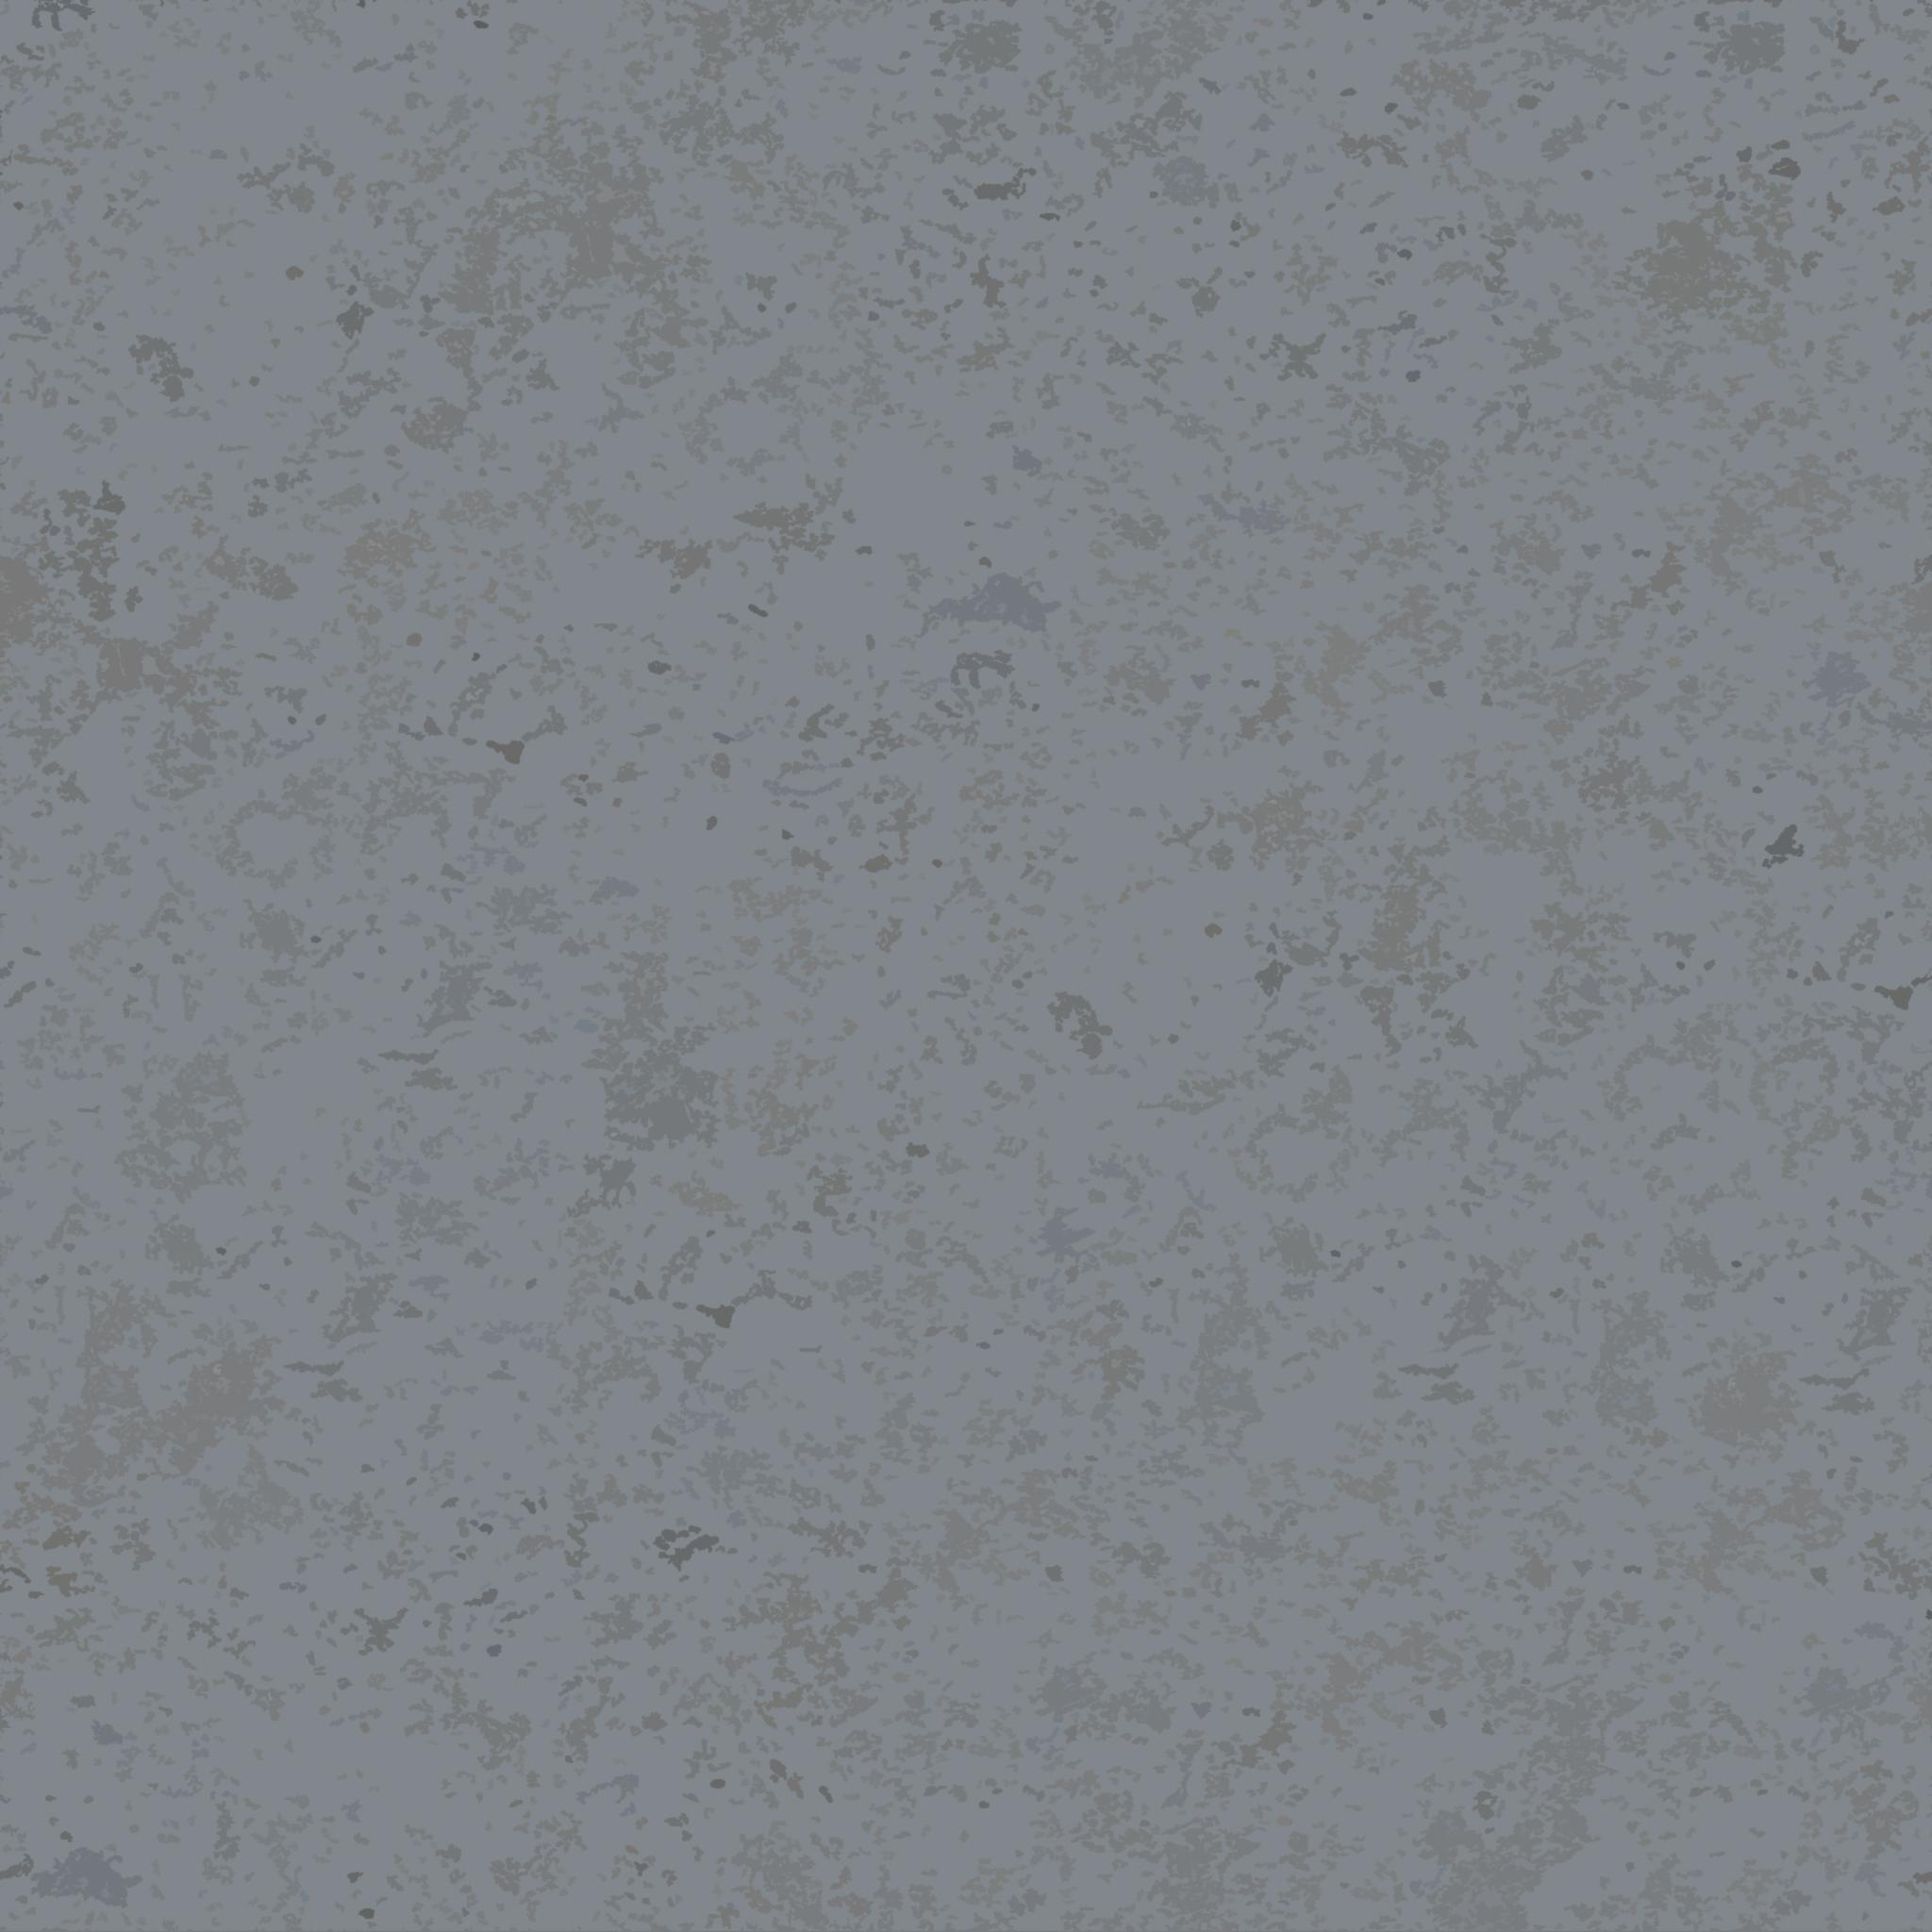 TXR - Concrete / Pavement - Cartoon | Soundimage.org